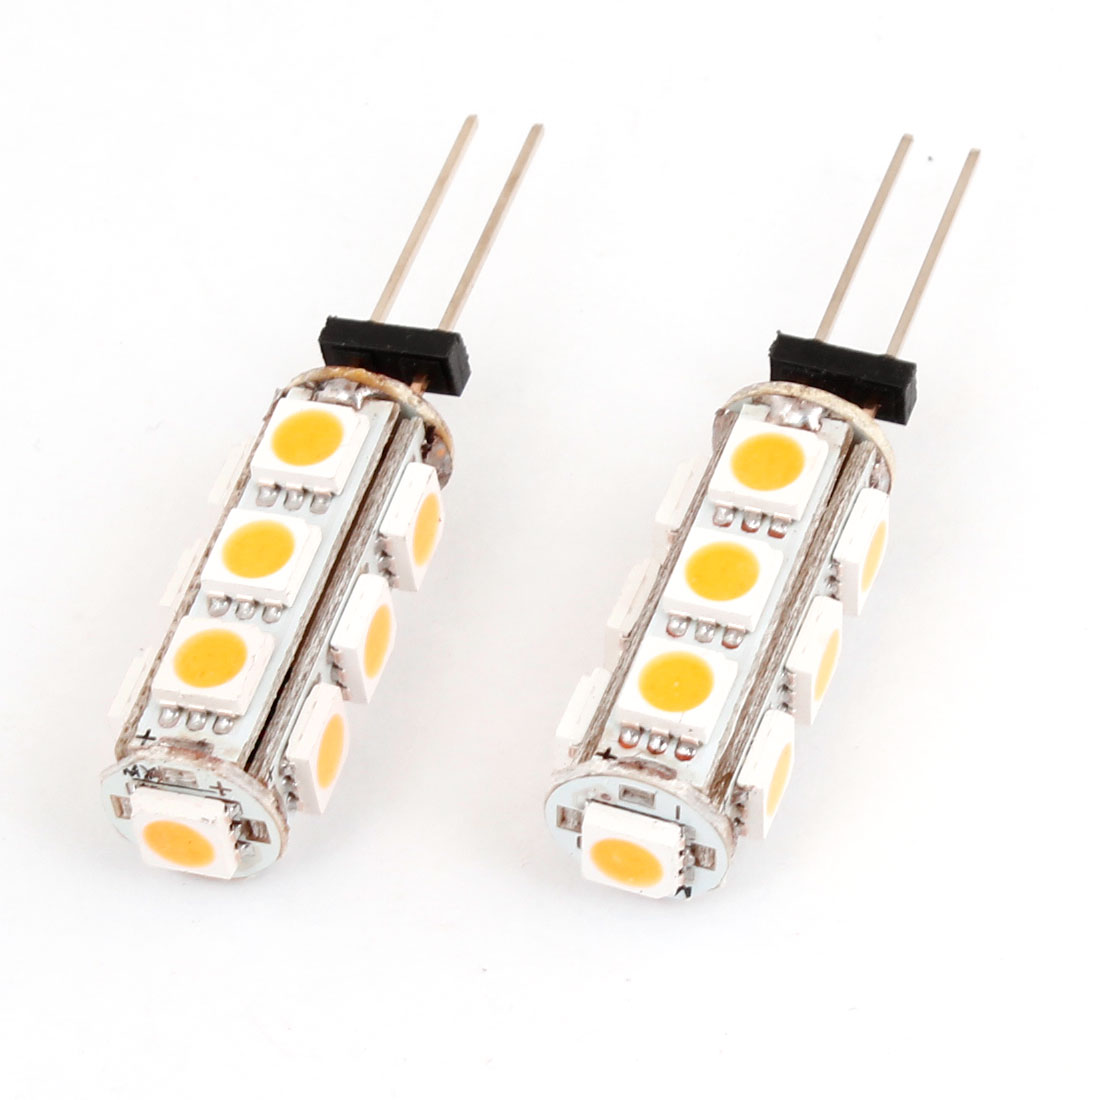 Universal Car G4 Lamp Holder 5050 SMD 13 LED Warm White Light 2pcs